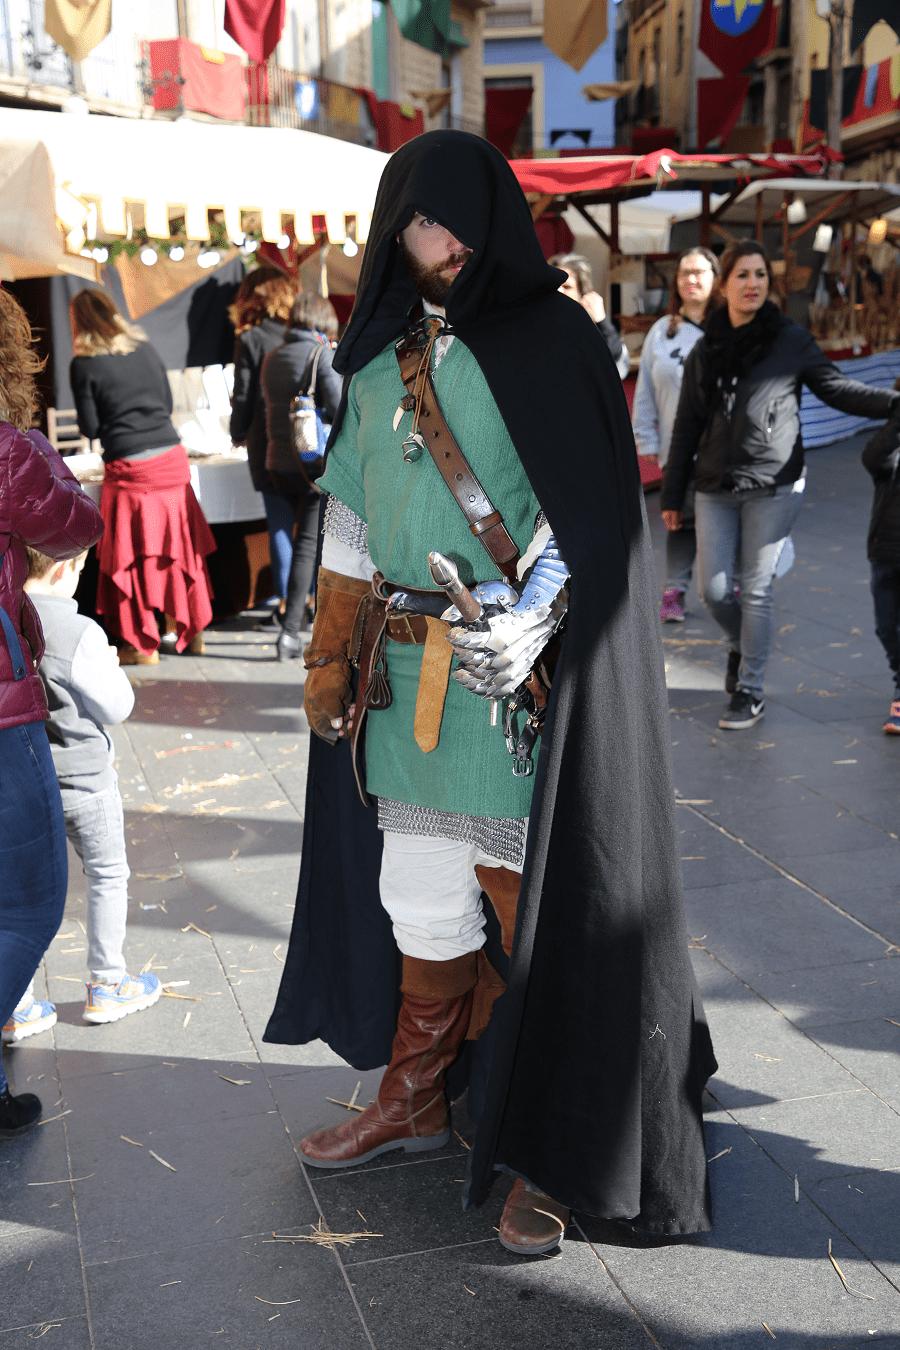 Foire médiévale de Manresa